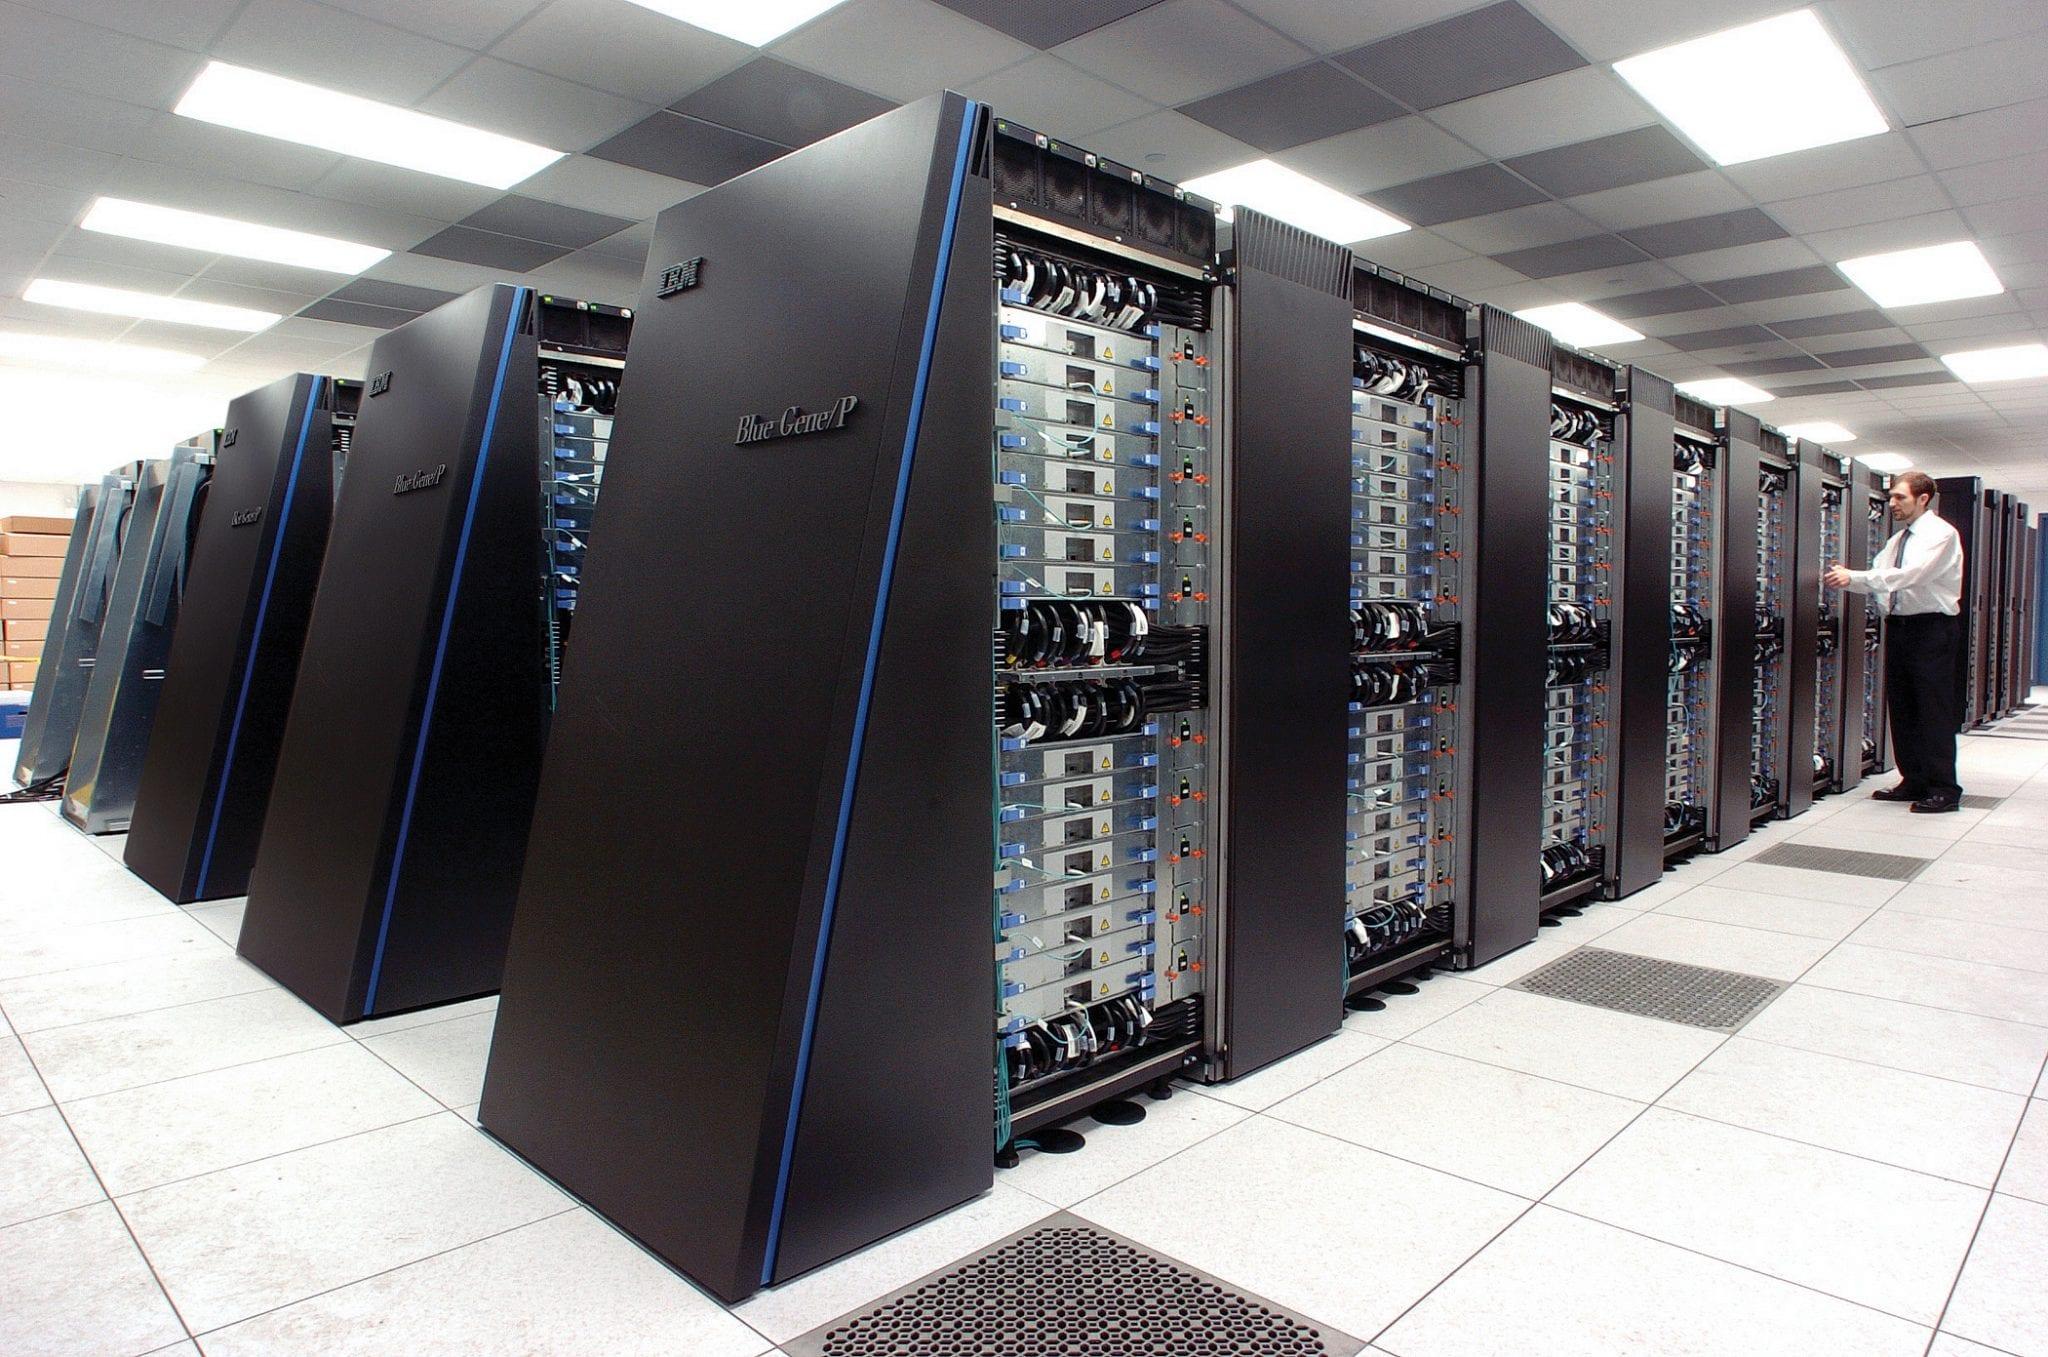 IBM datacenter